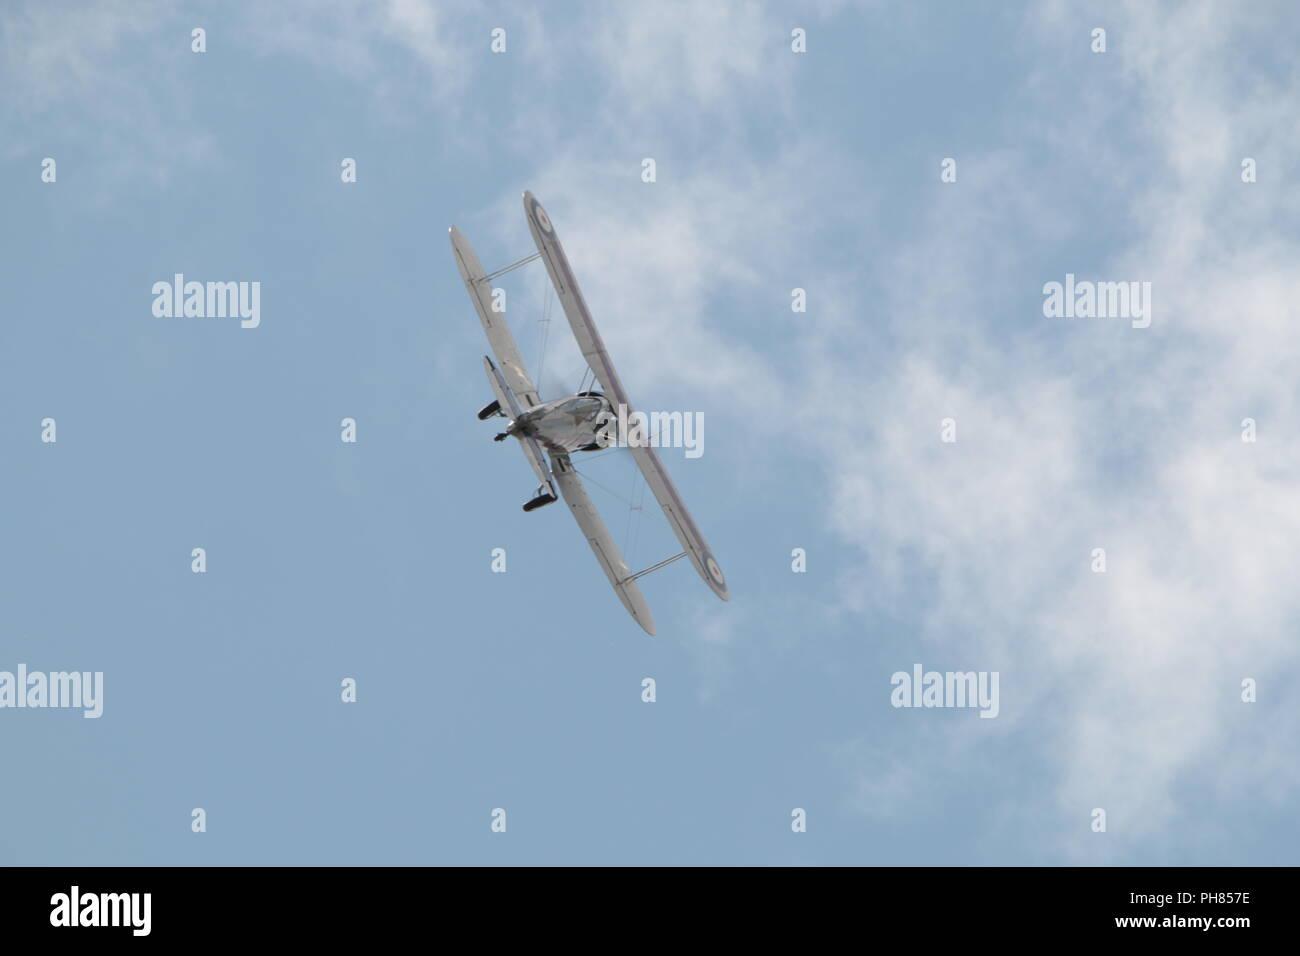 Gloster Gladiator - Stock Image